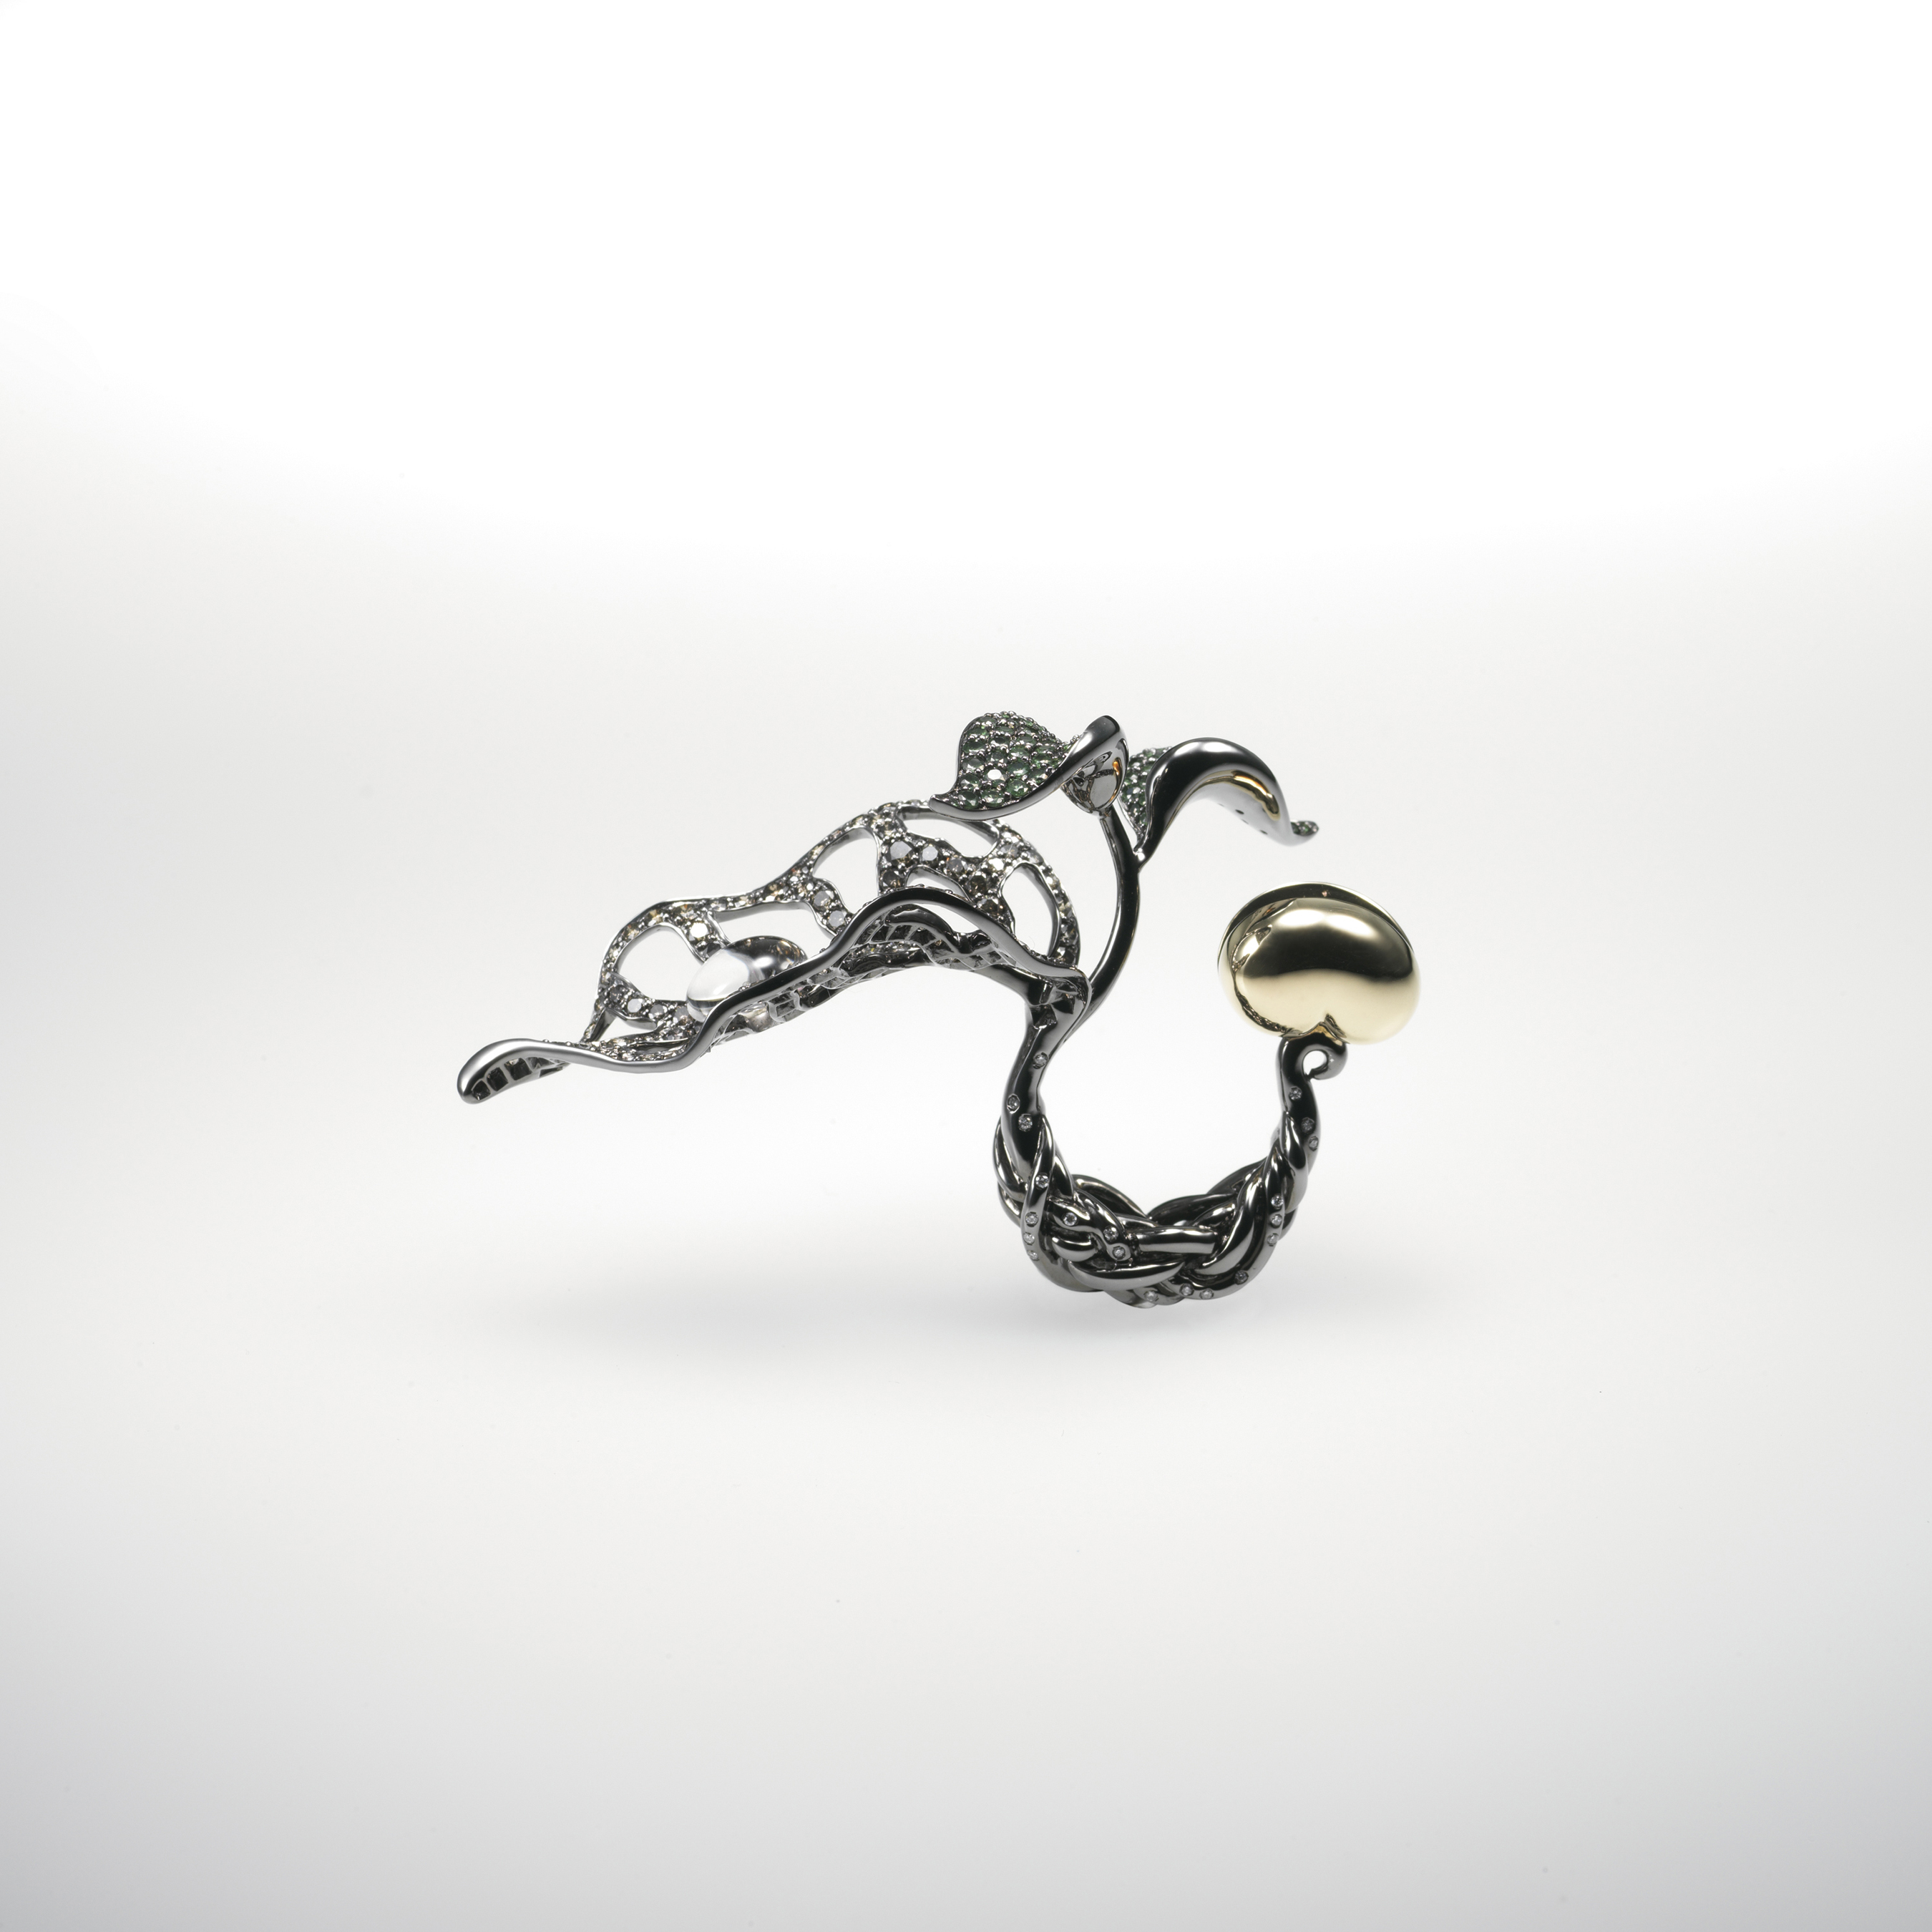 hktdccom Hong Kong Jewellery Design Competition Winners Named HKTDC